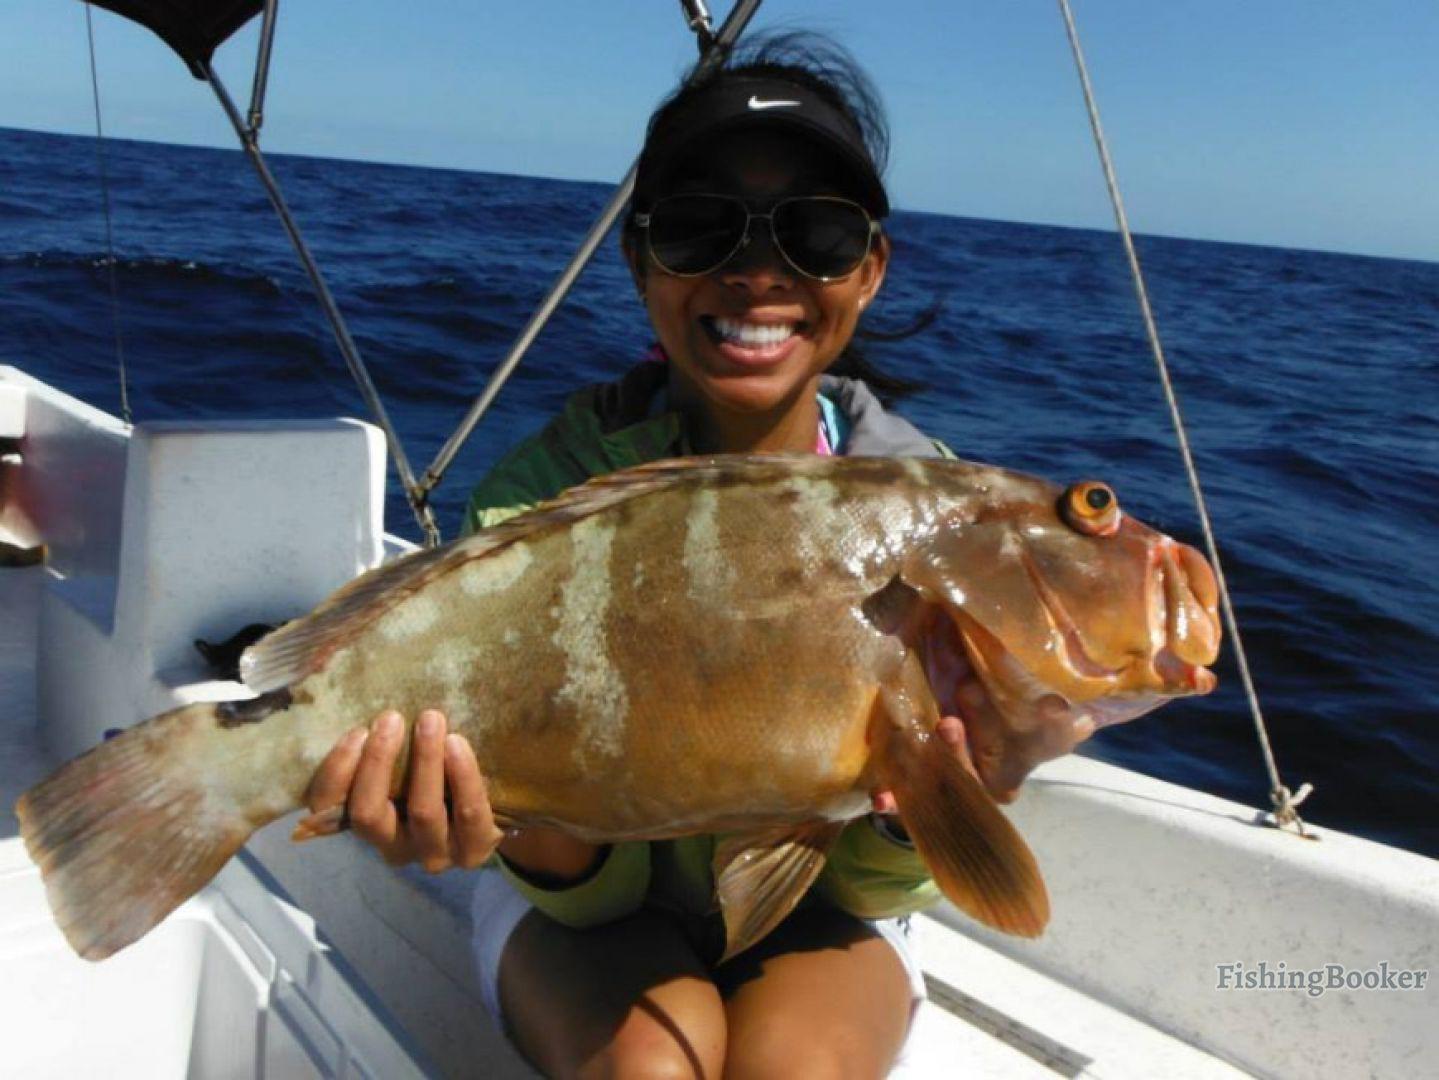 Esley usher fishing agua mala caye caulker belize for Belize fishing charters